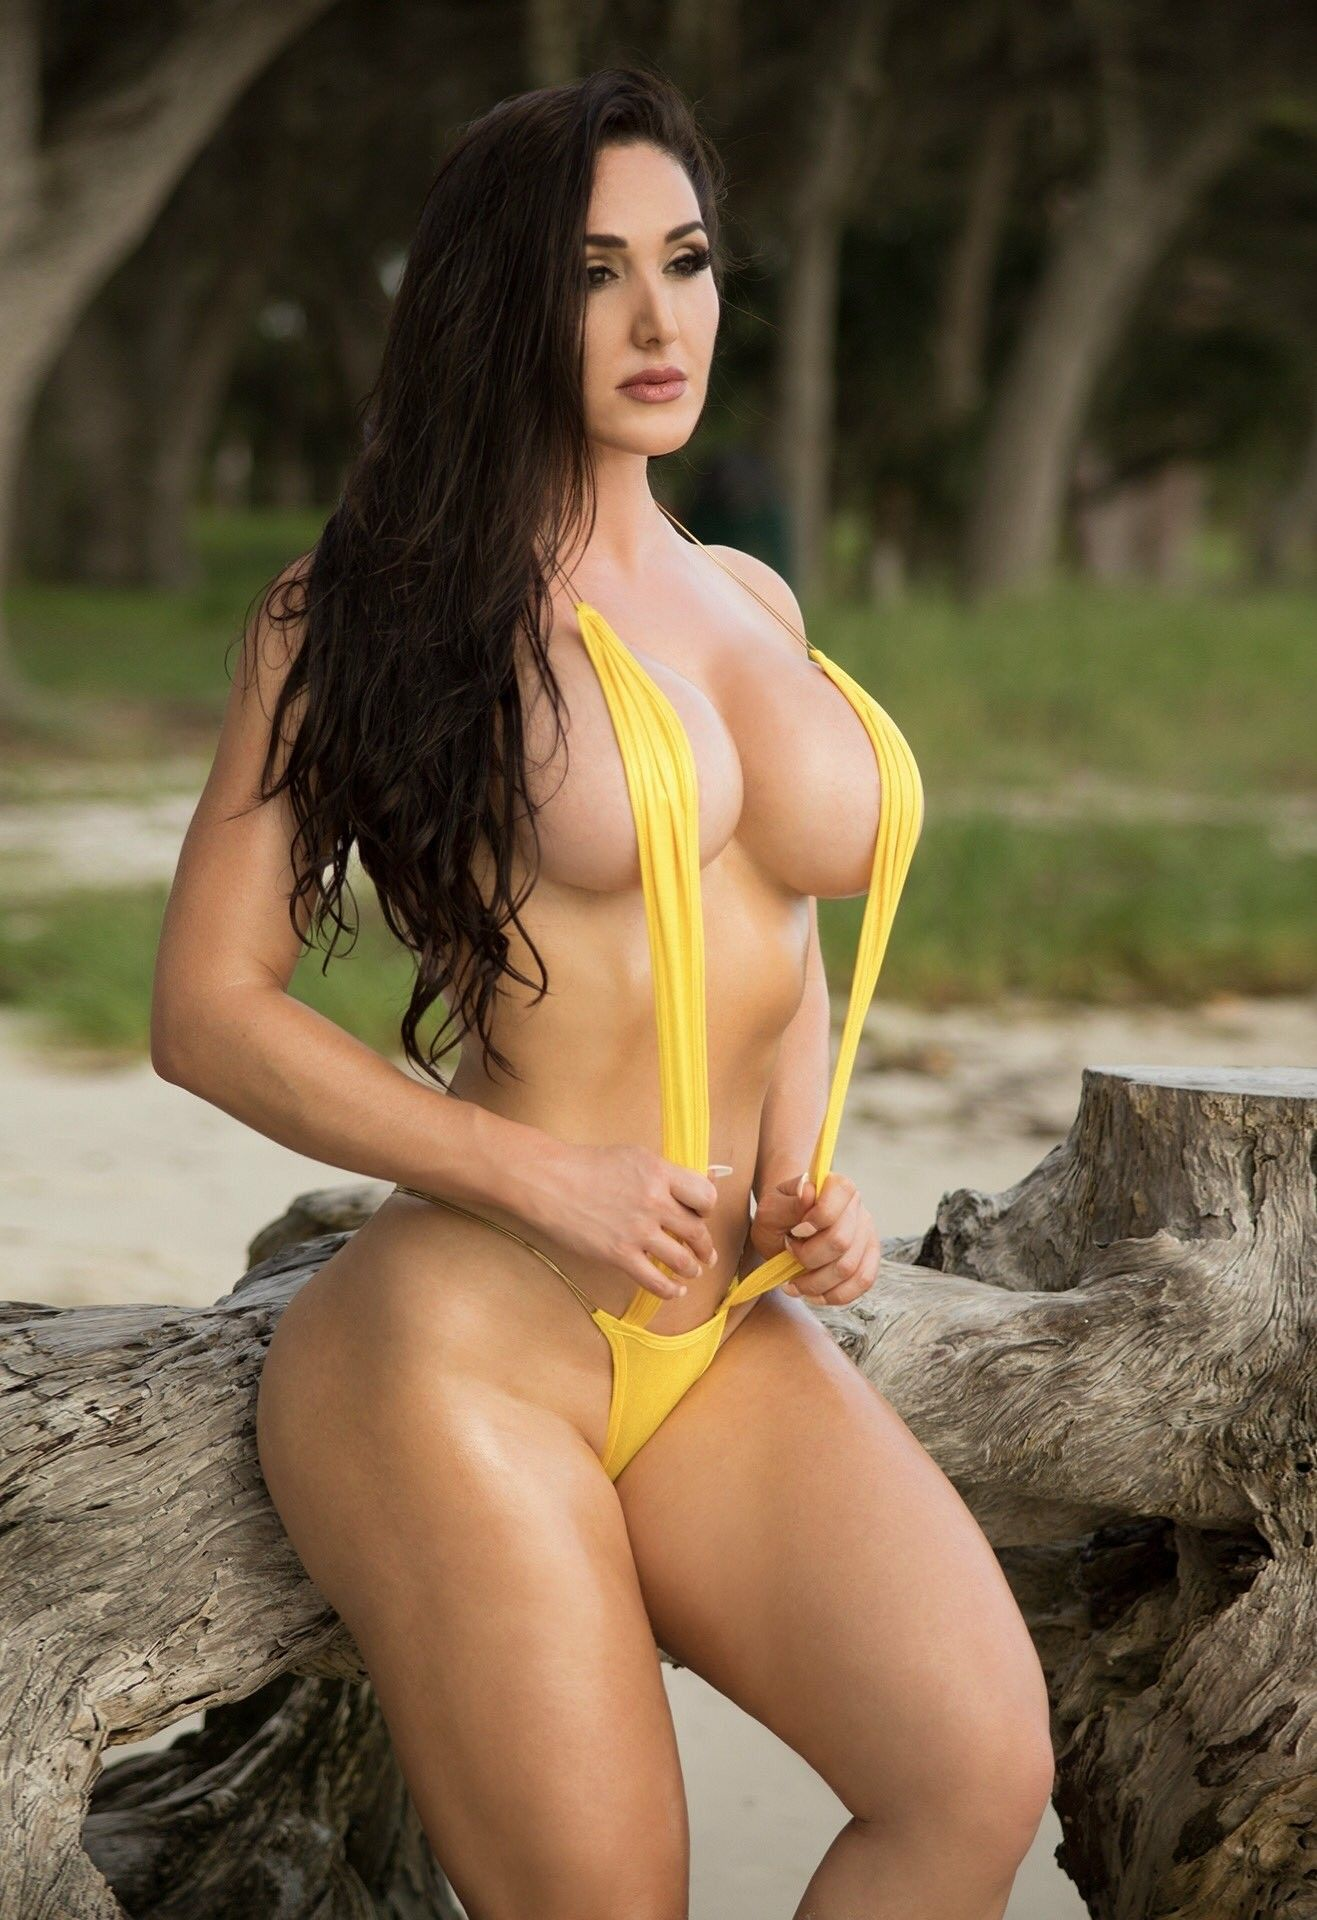 Big fake tits of gia macool busting out of micro bikini